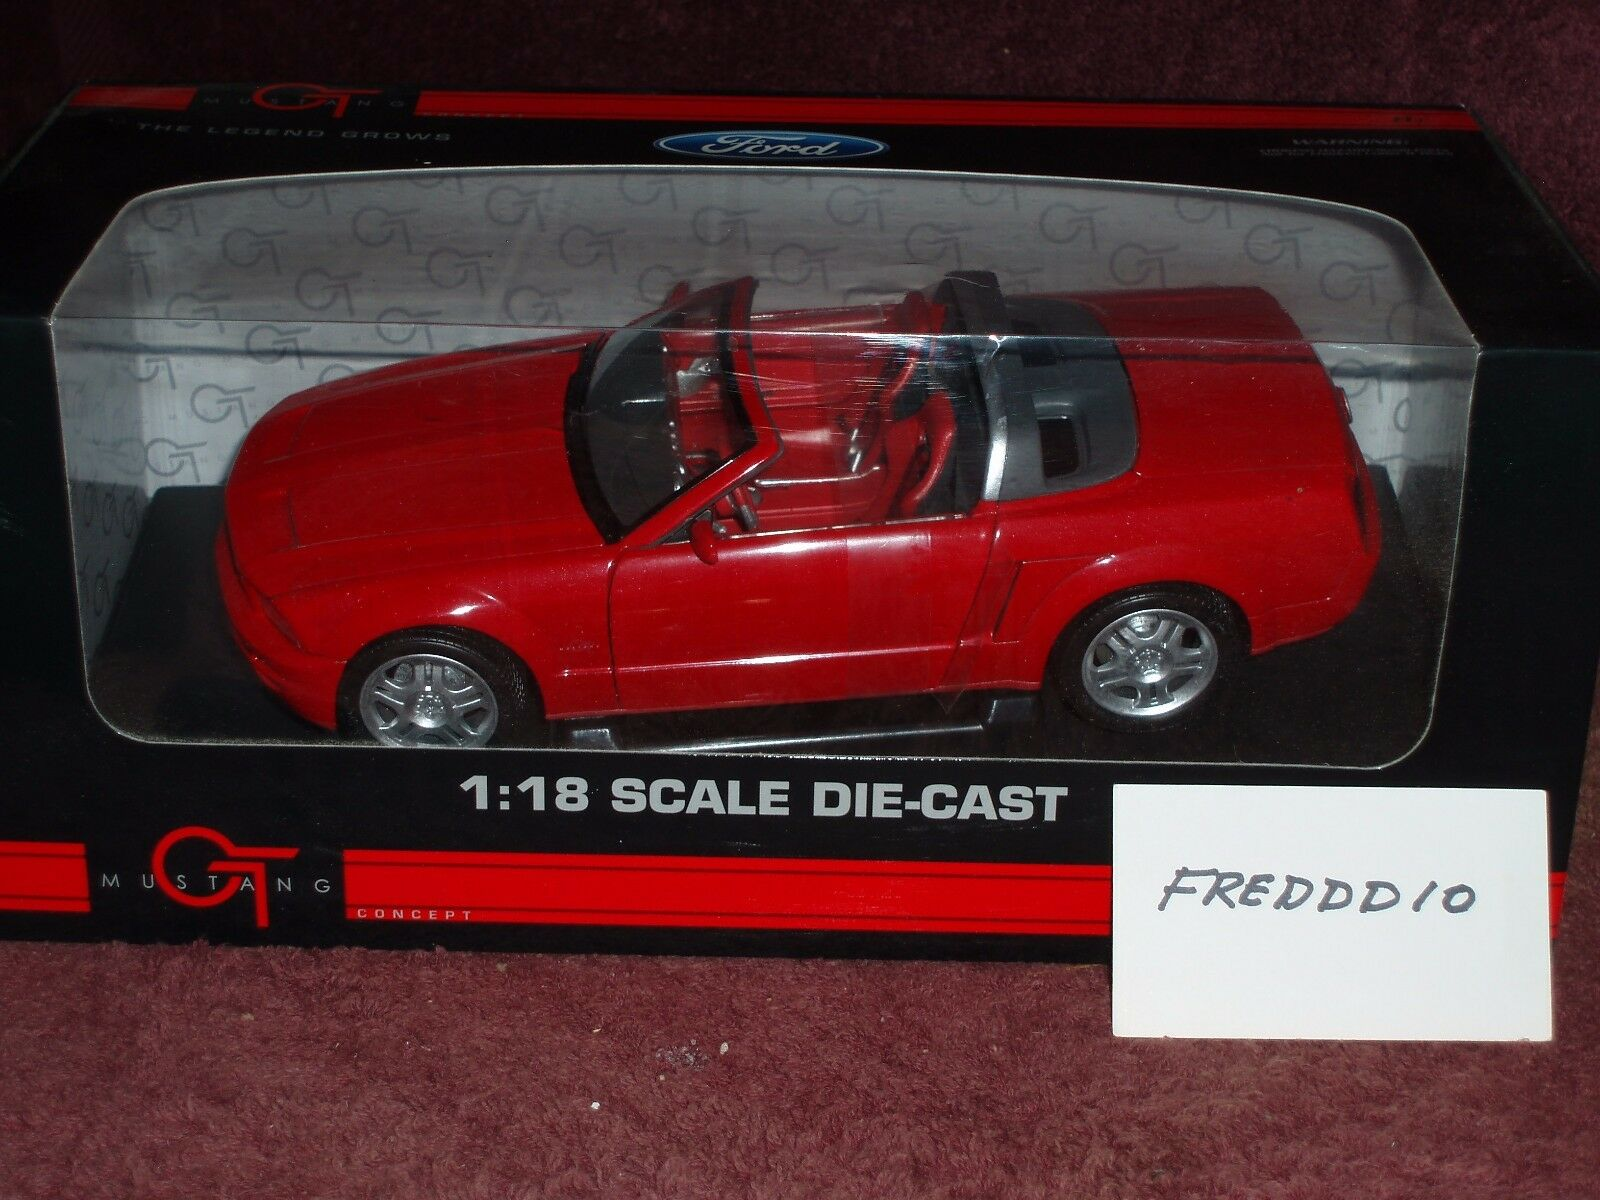 2004 05 FORD MUSTANG CONCEPT CONgreenIBLE CONgreenIBLE CONgreenIBLE RED 1 18 NICE CAR   f27e87